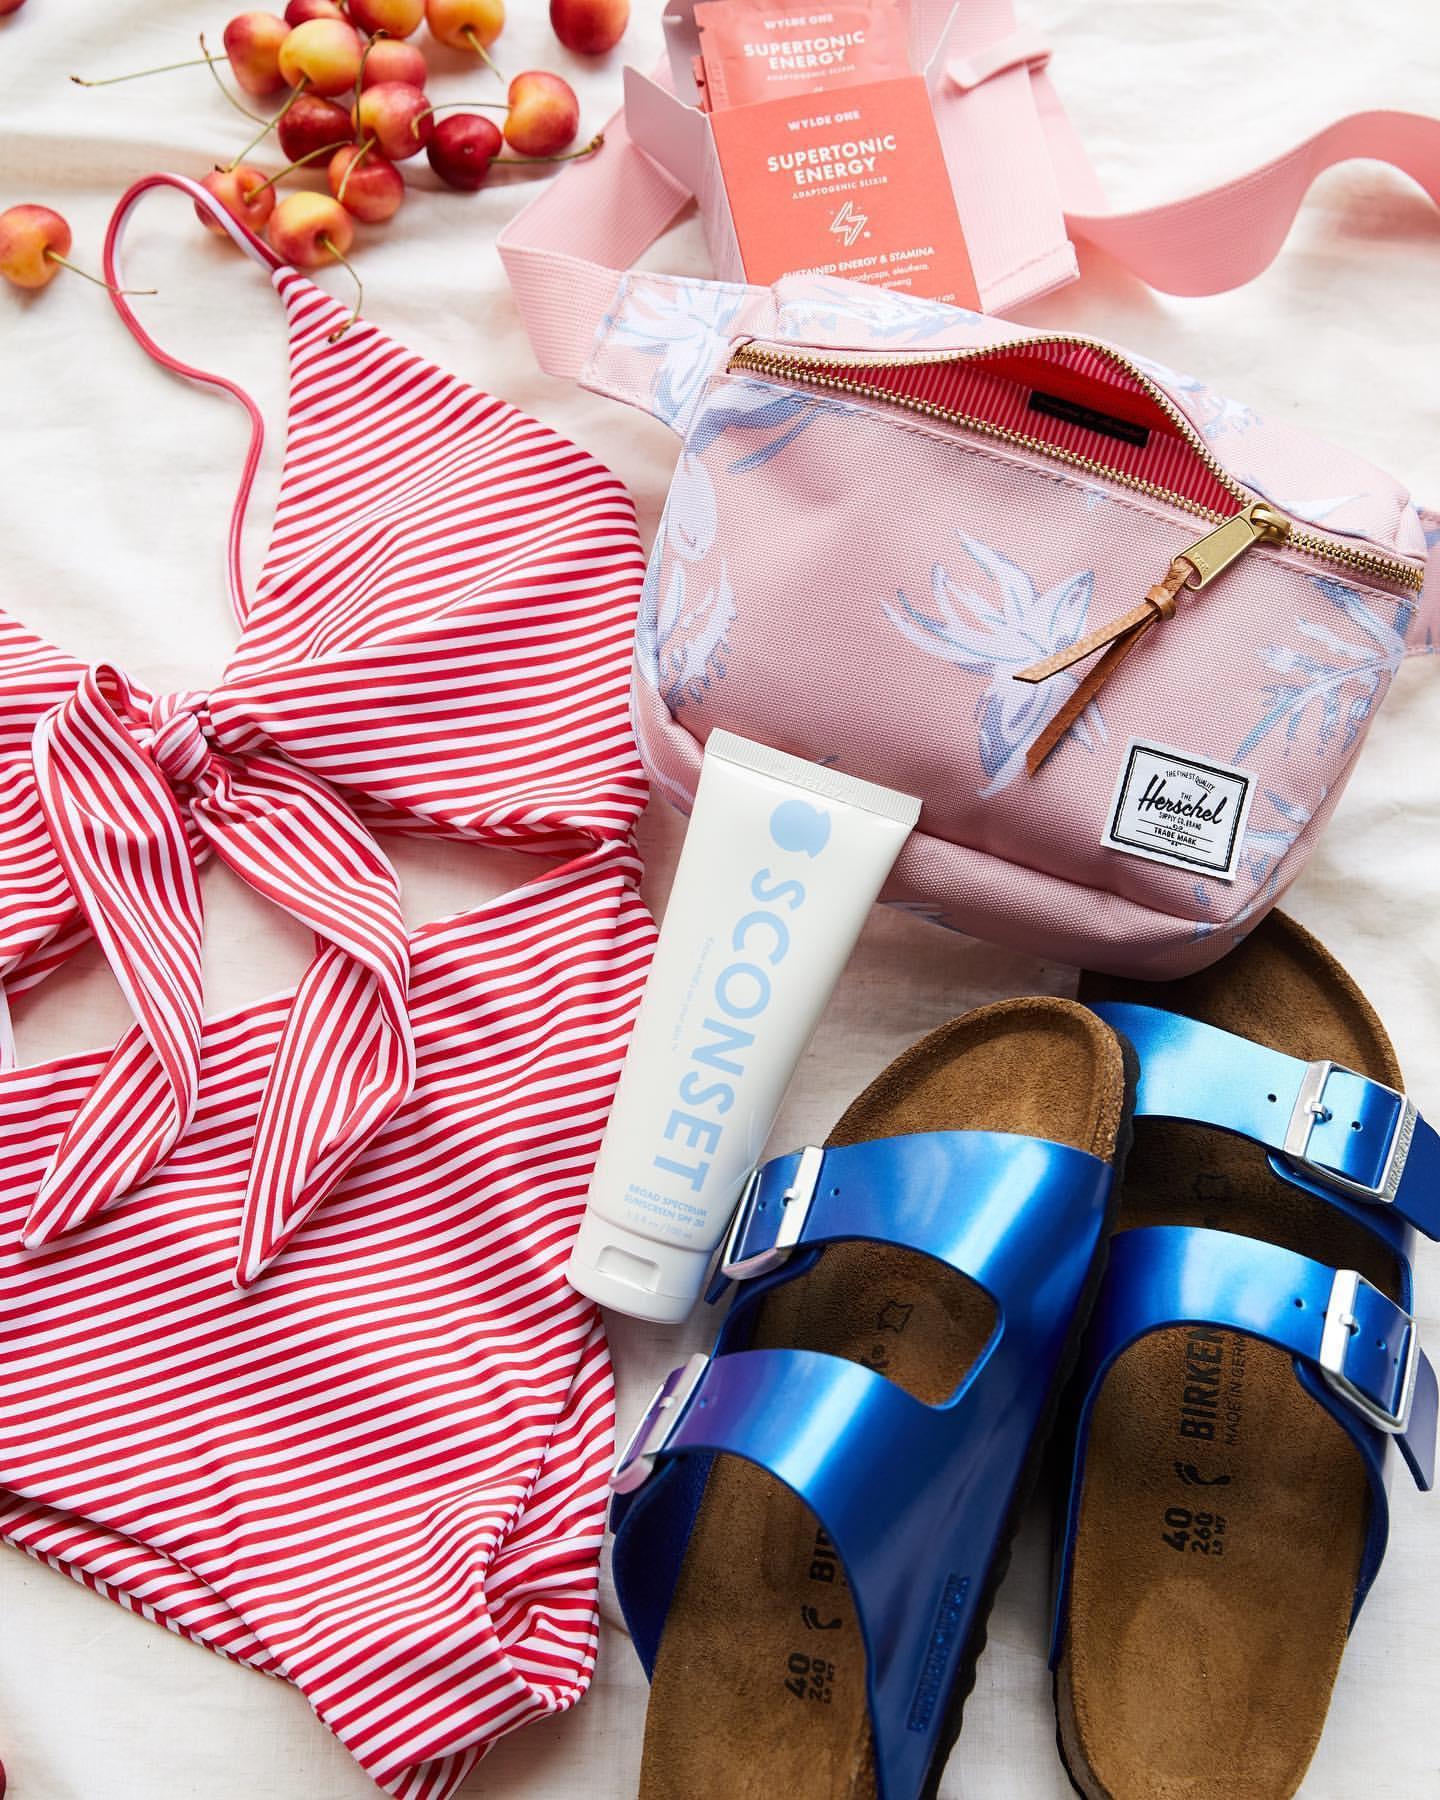 bag swimwear shoes